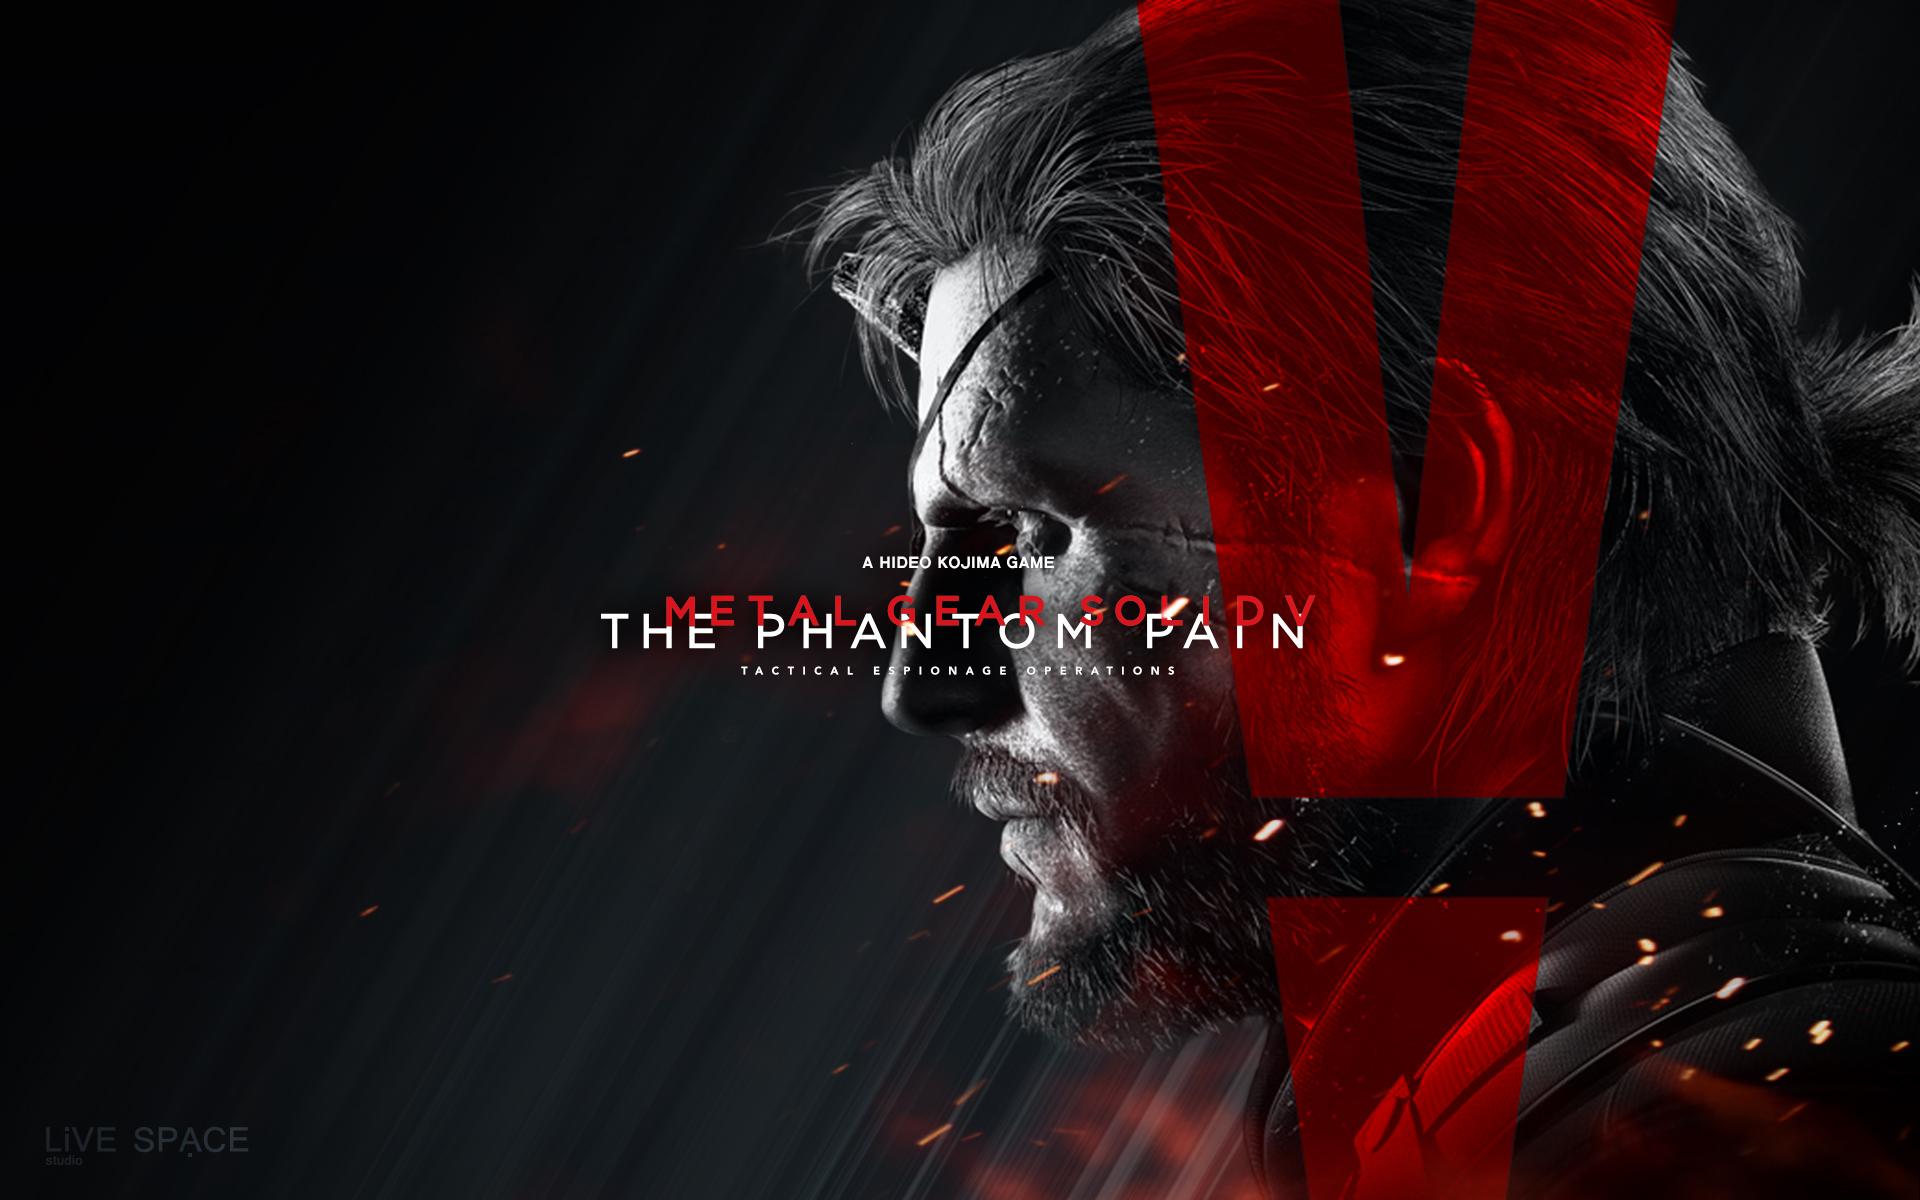 https://i1.wp.com/orig09.deviantart.net/25eb/f/2015/007/8/d/ls_metal_gear_solid_v__the_phantom_pain_by_1n_stereo-d8cz9ym.jpg